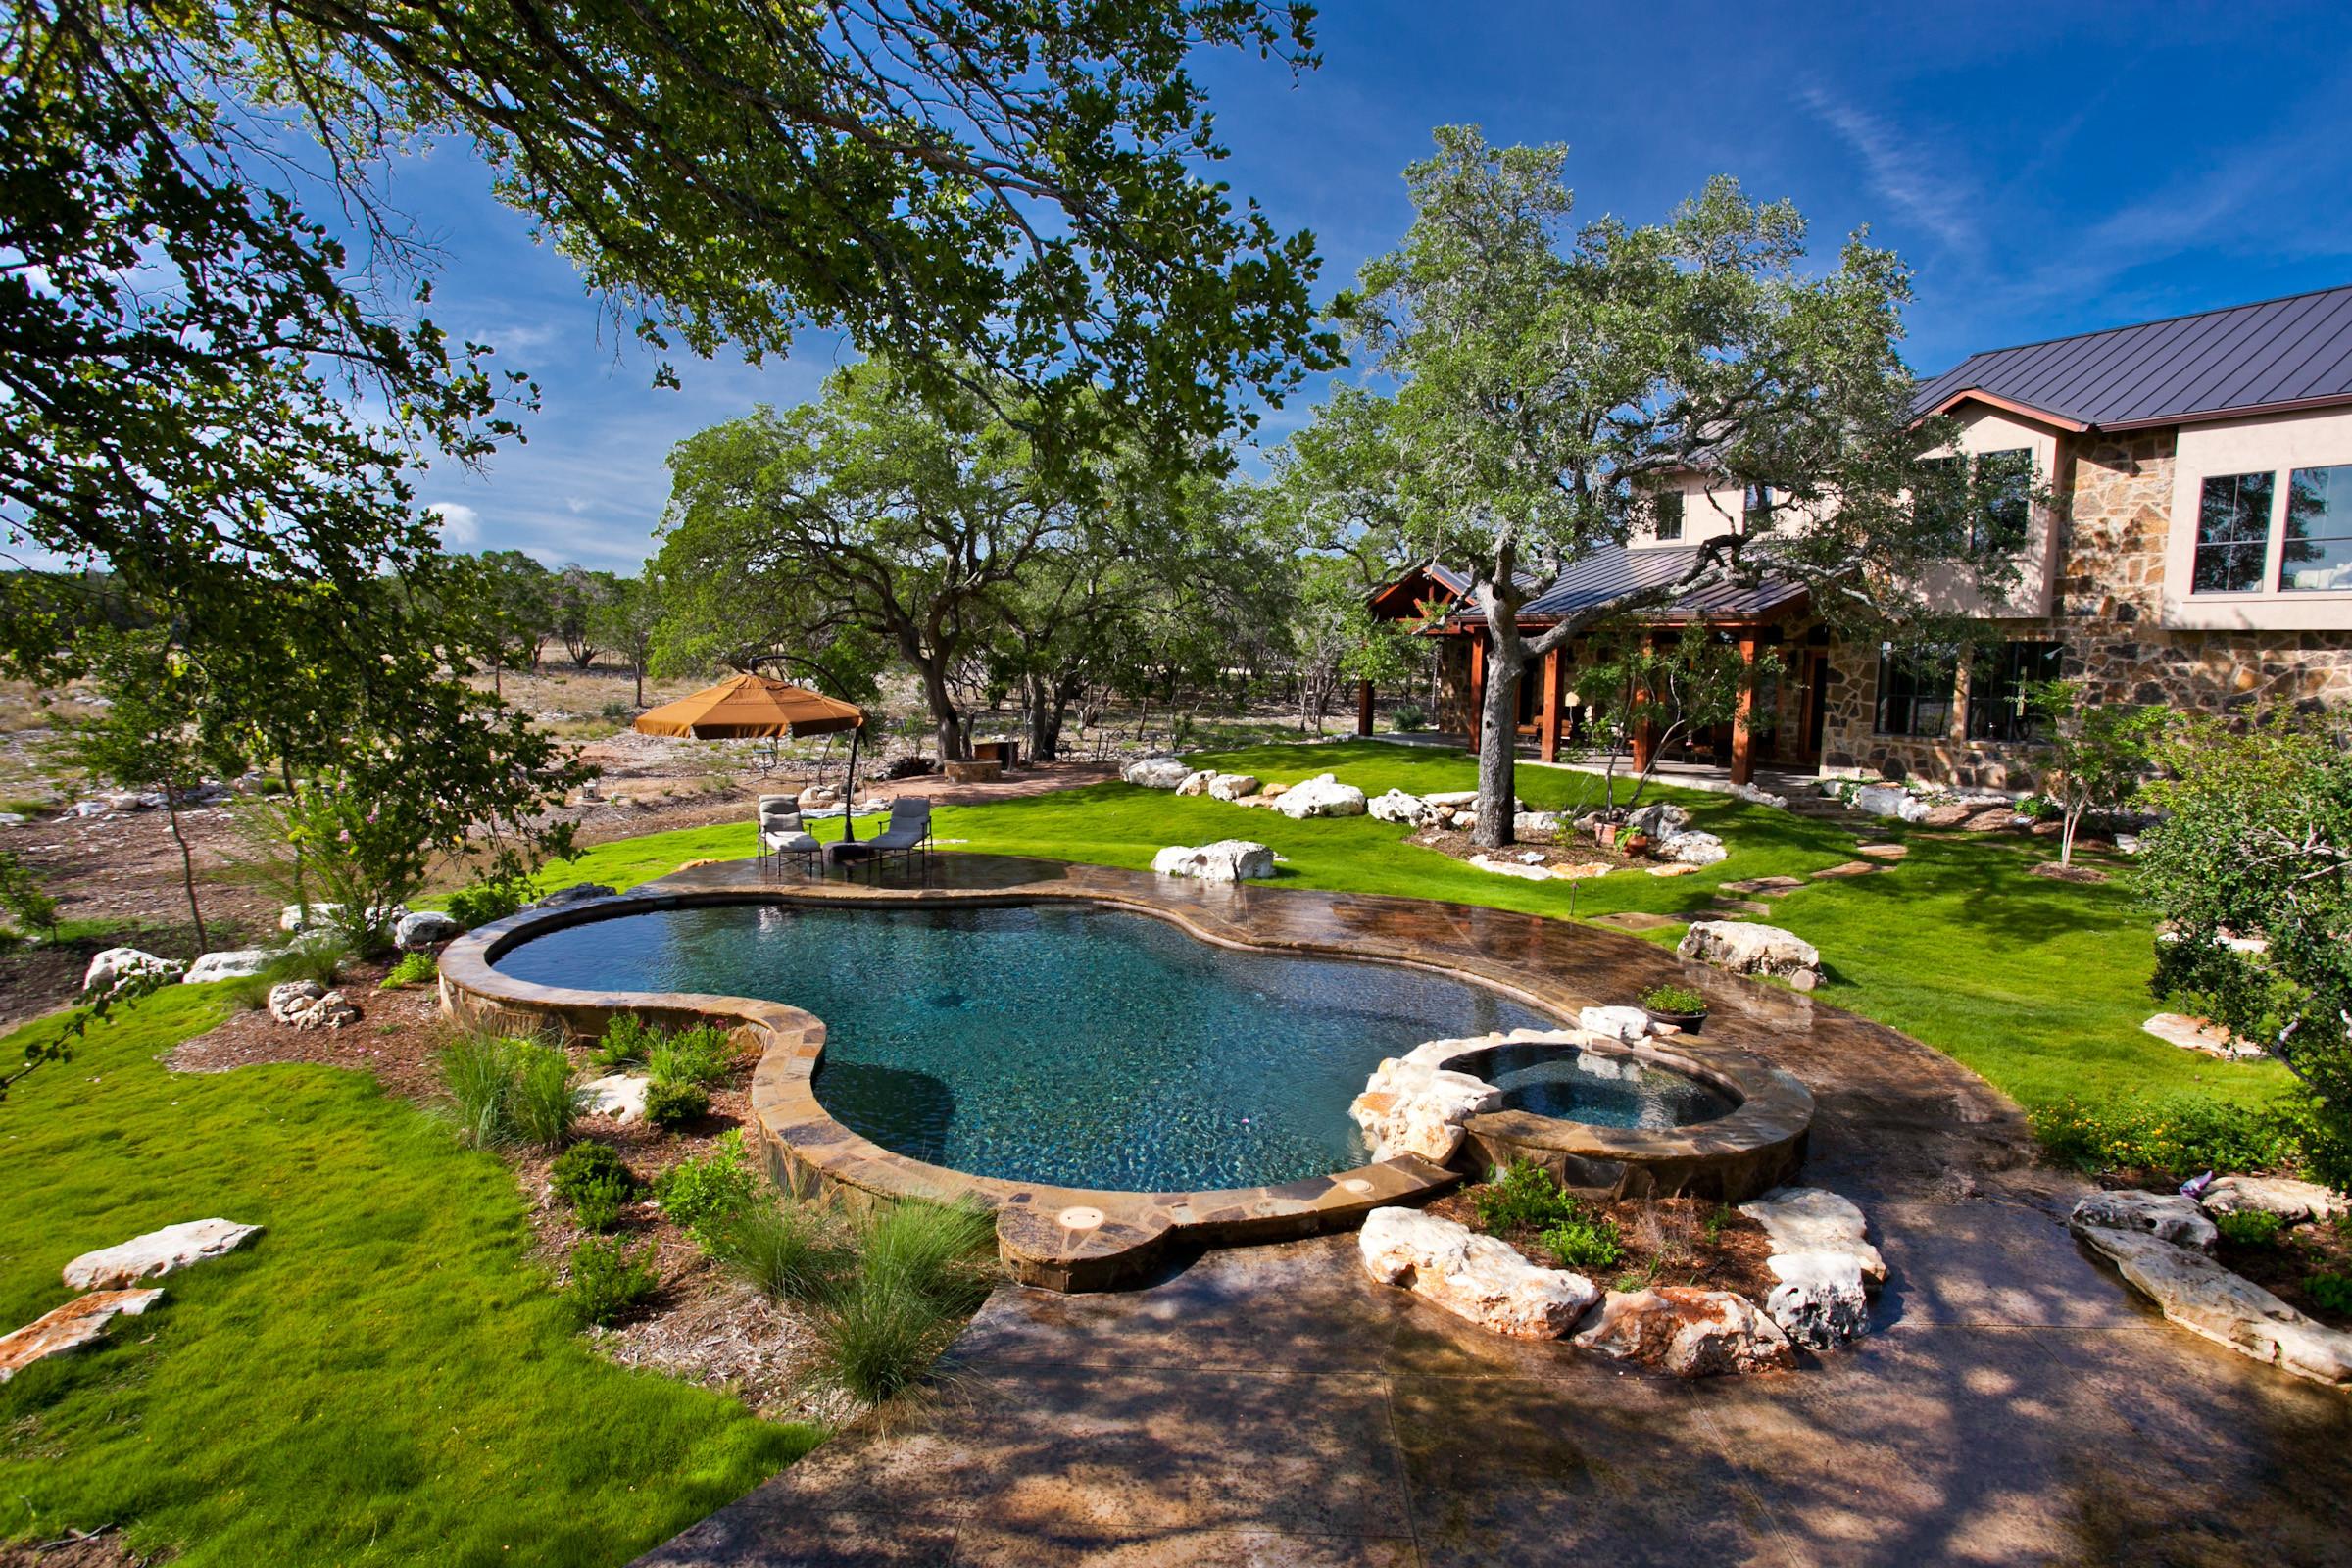 Bulverde Natural Pool/Spa/Outdoor Living/Sport Court